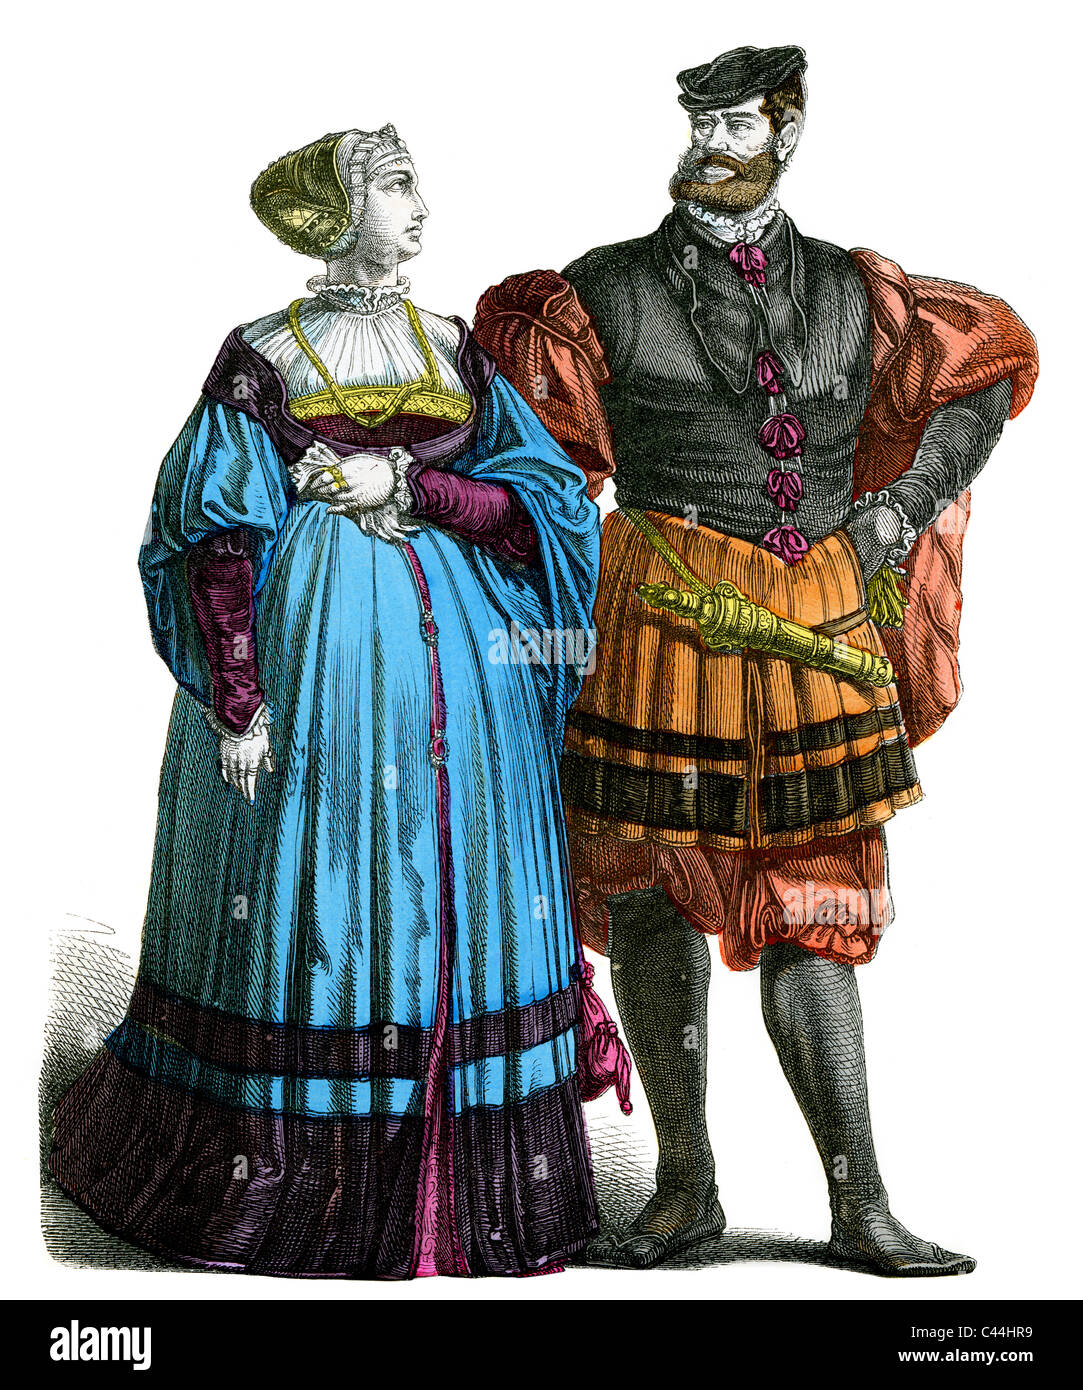 Noblemen for Clothing best photo